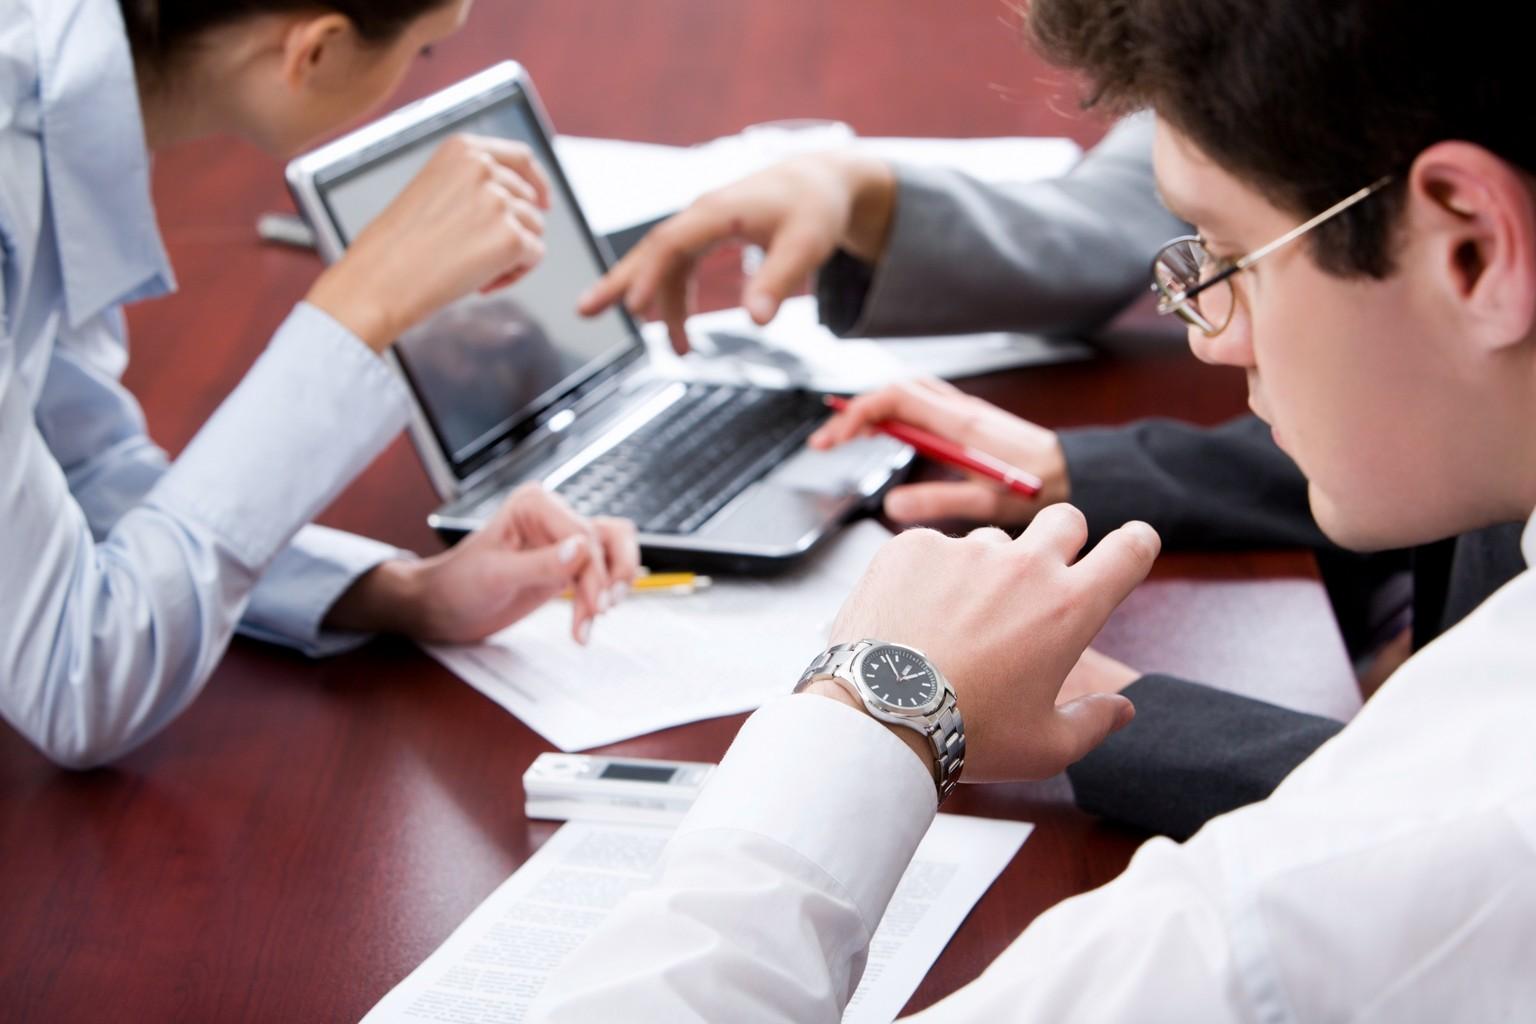 Business ethics a case study approach pdf